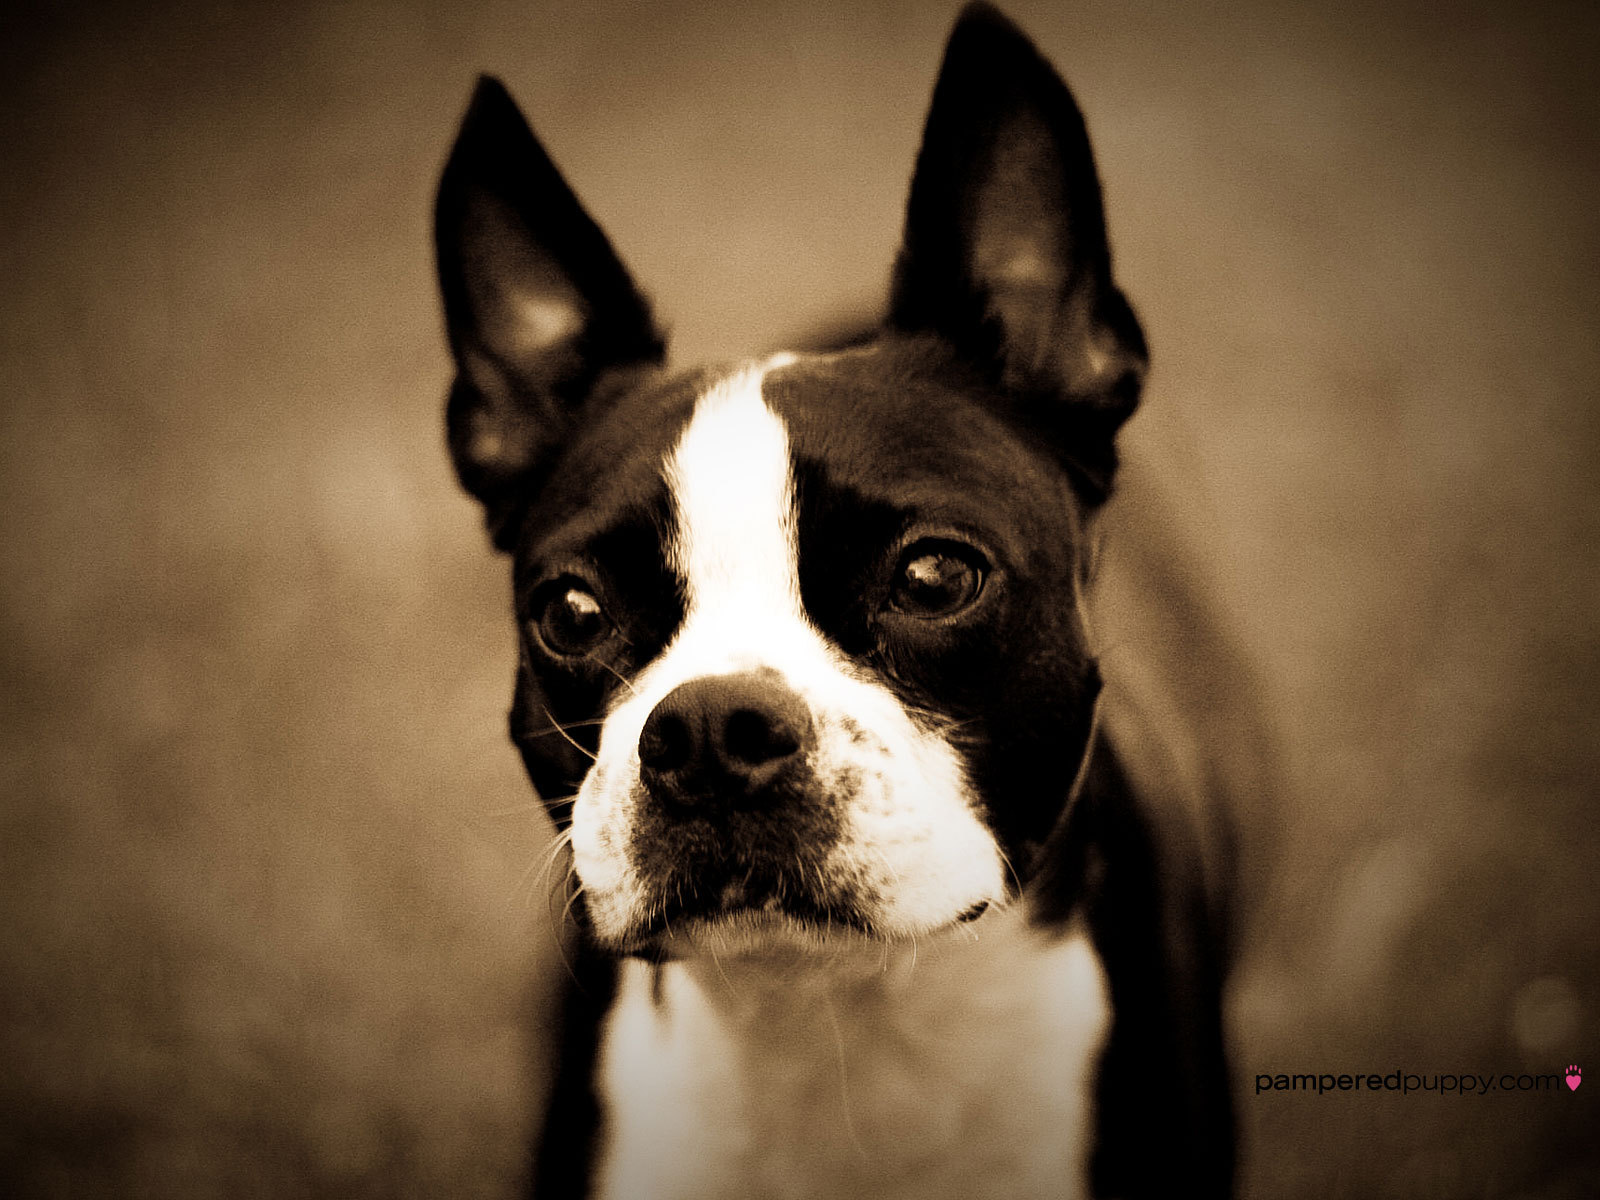 Boston Terrier Dog: Boston Boston Terrier Boston Terrier Breed